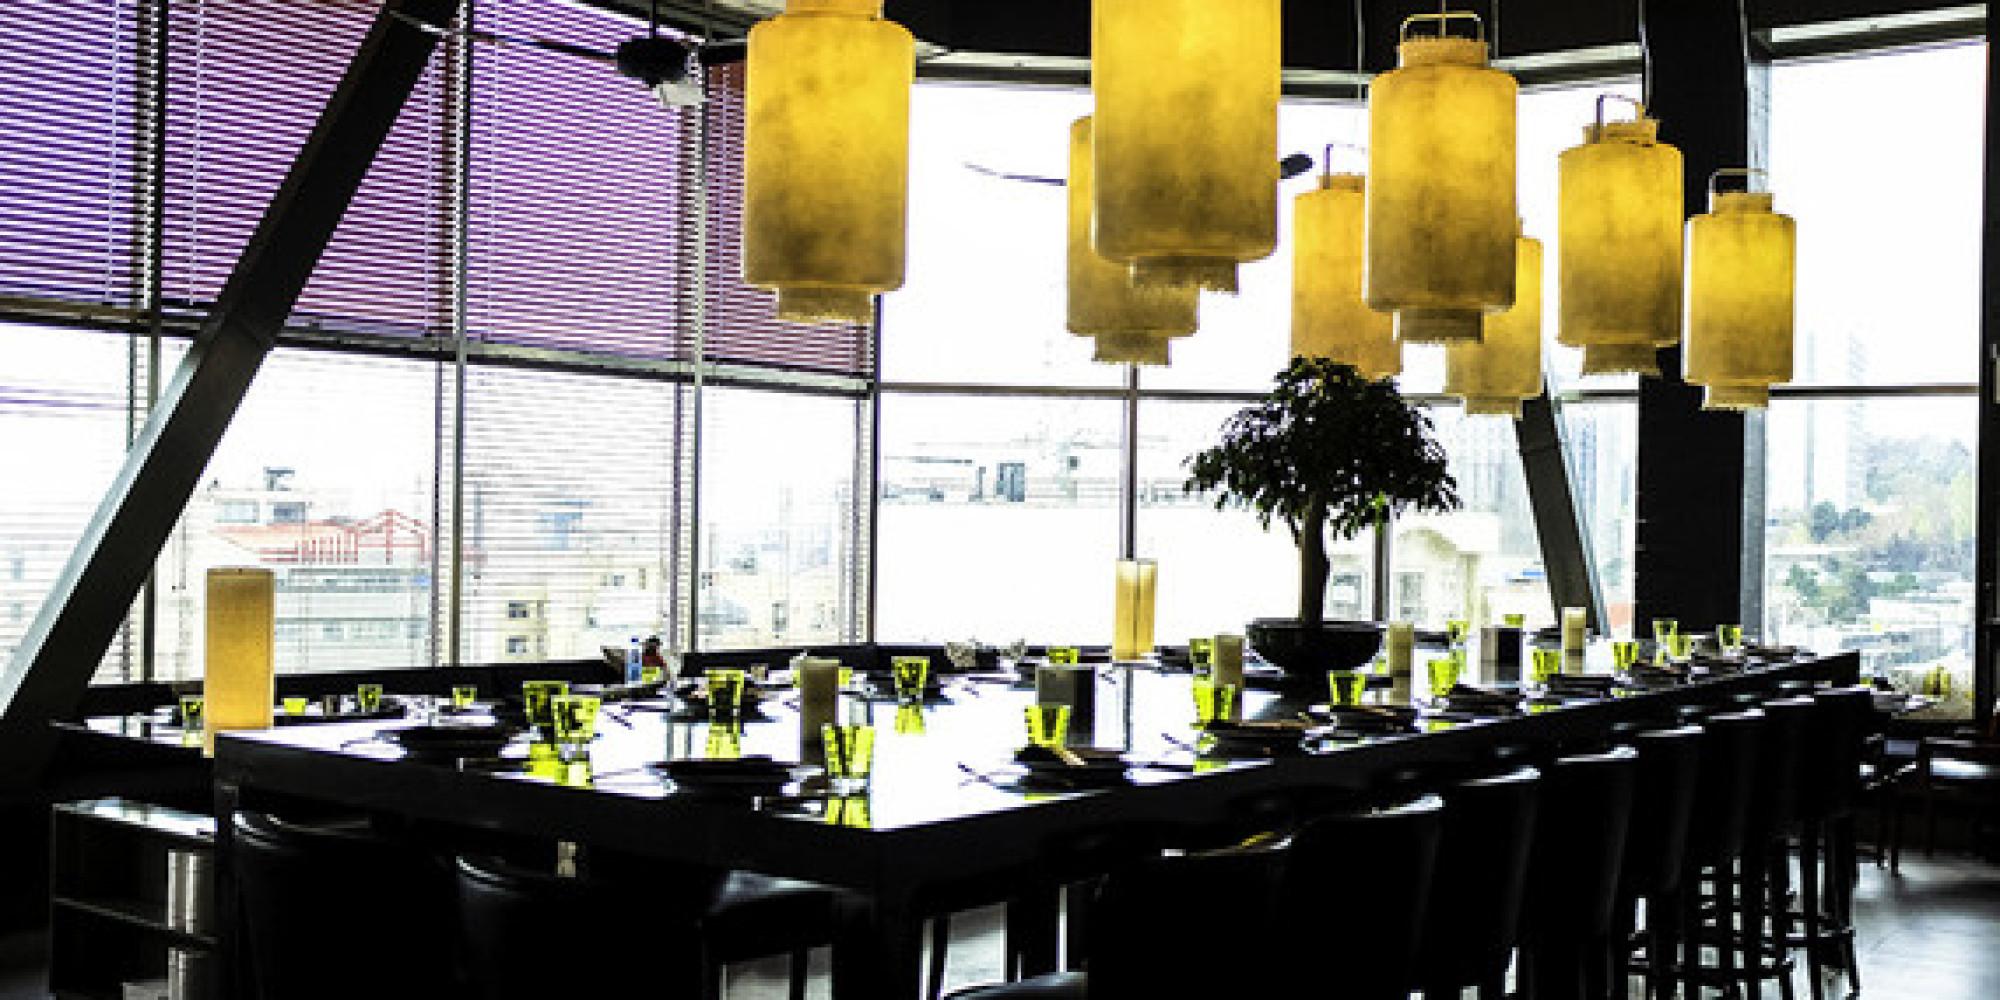 Top 10 tehran restaurants a culinary journey through iran for Divan restaurant tehran